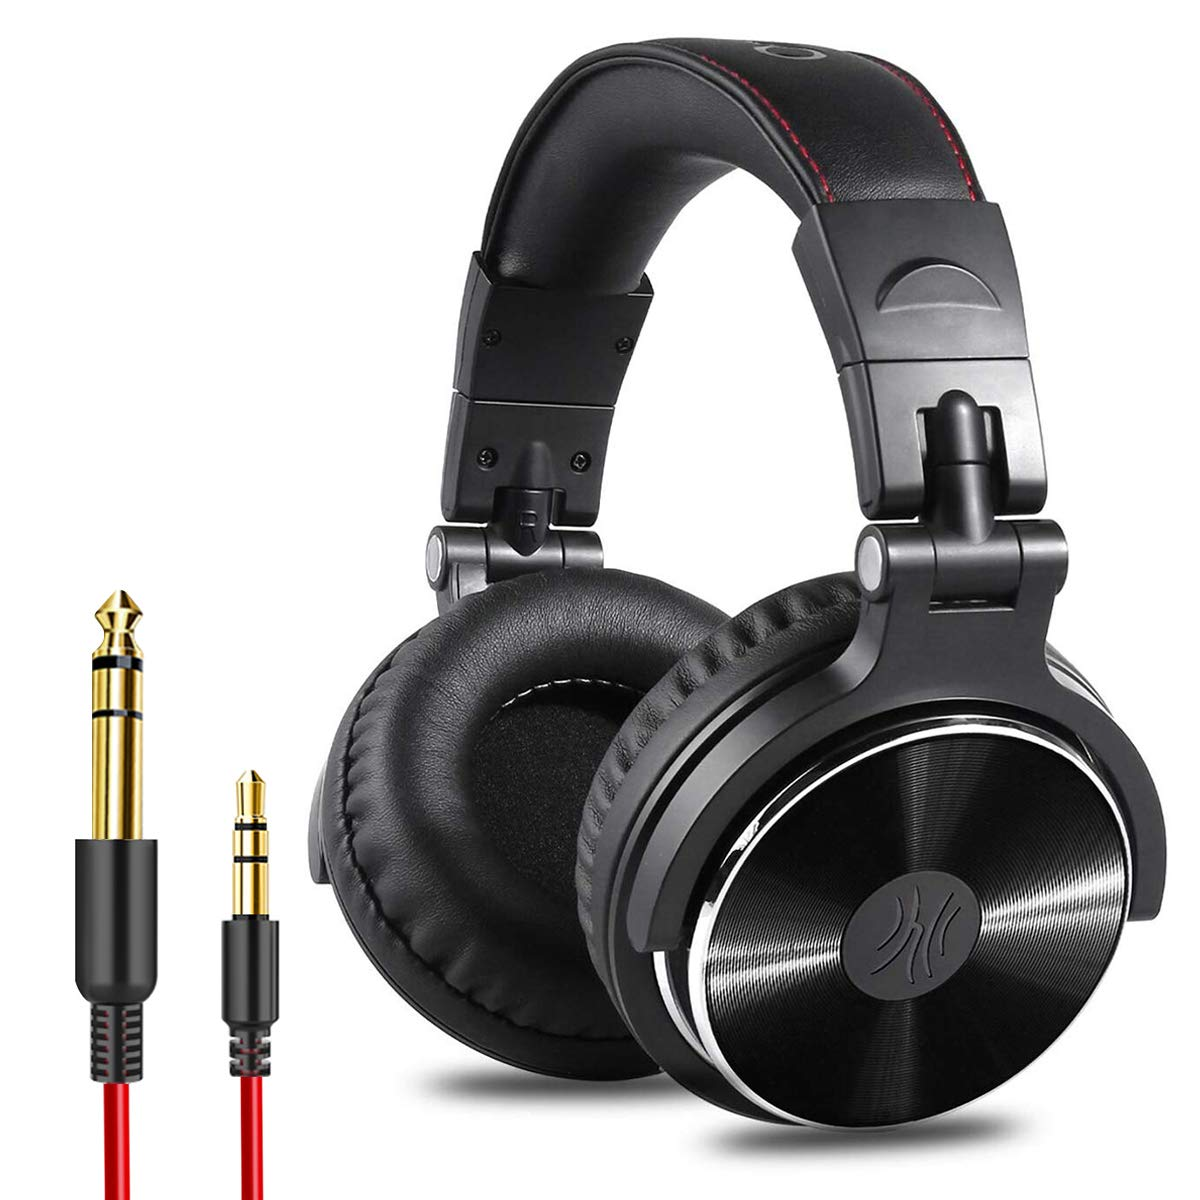 OneOdio Adapter Free Headphones Professional Telescopic